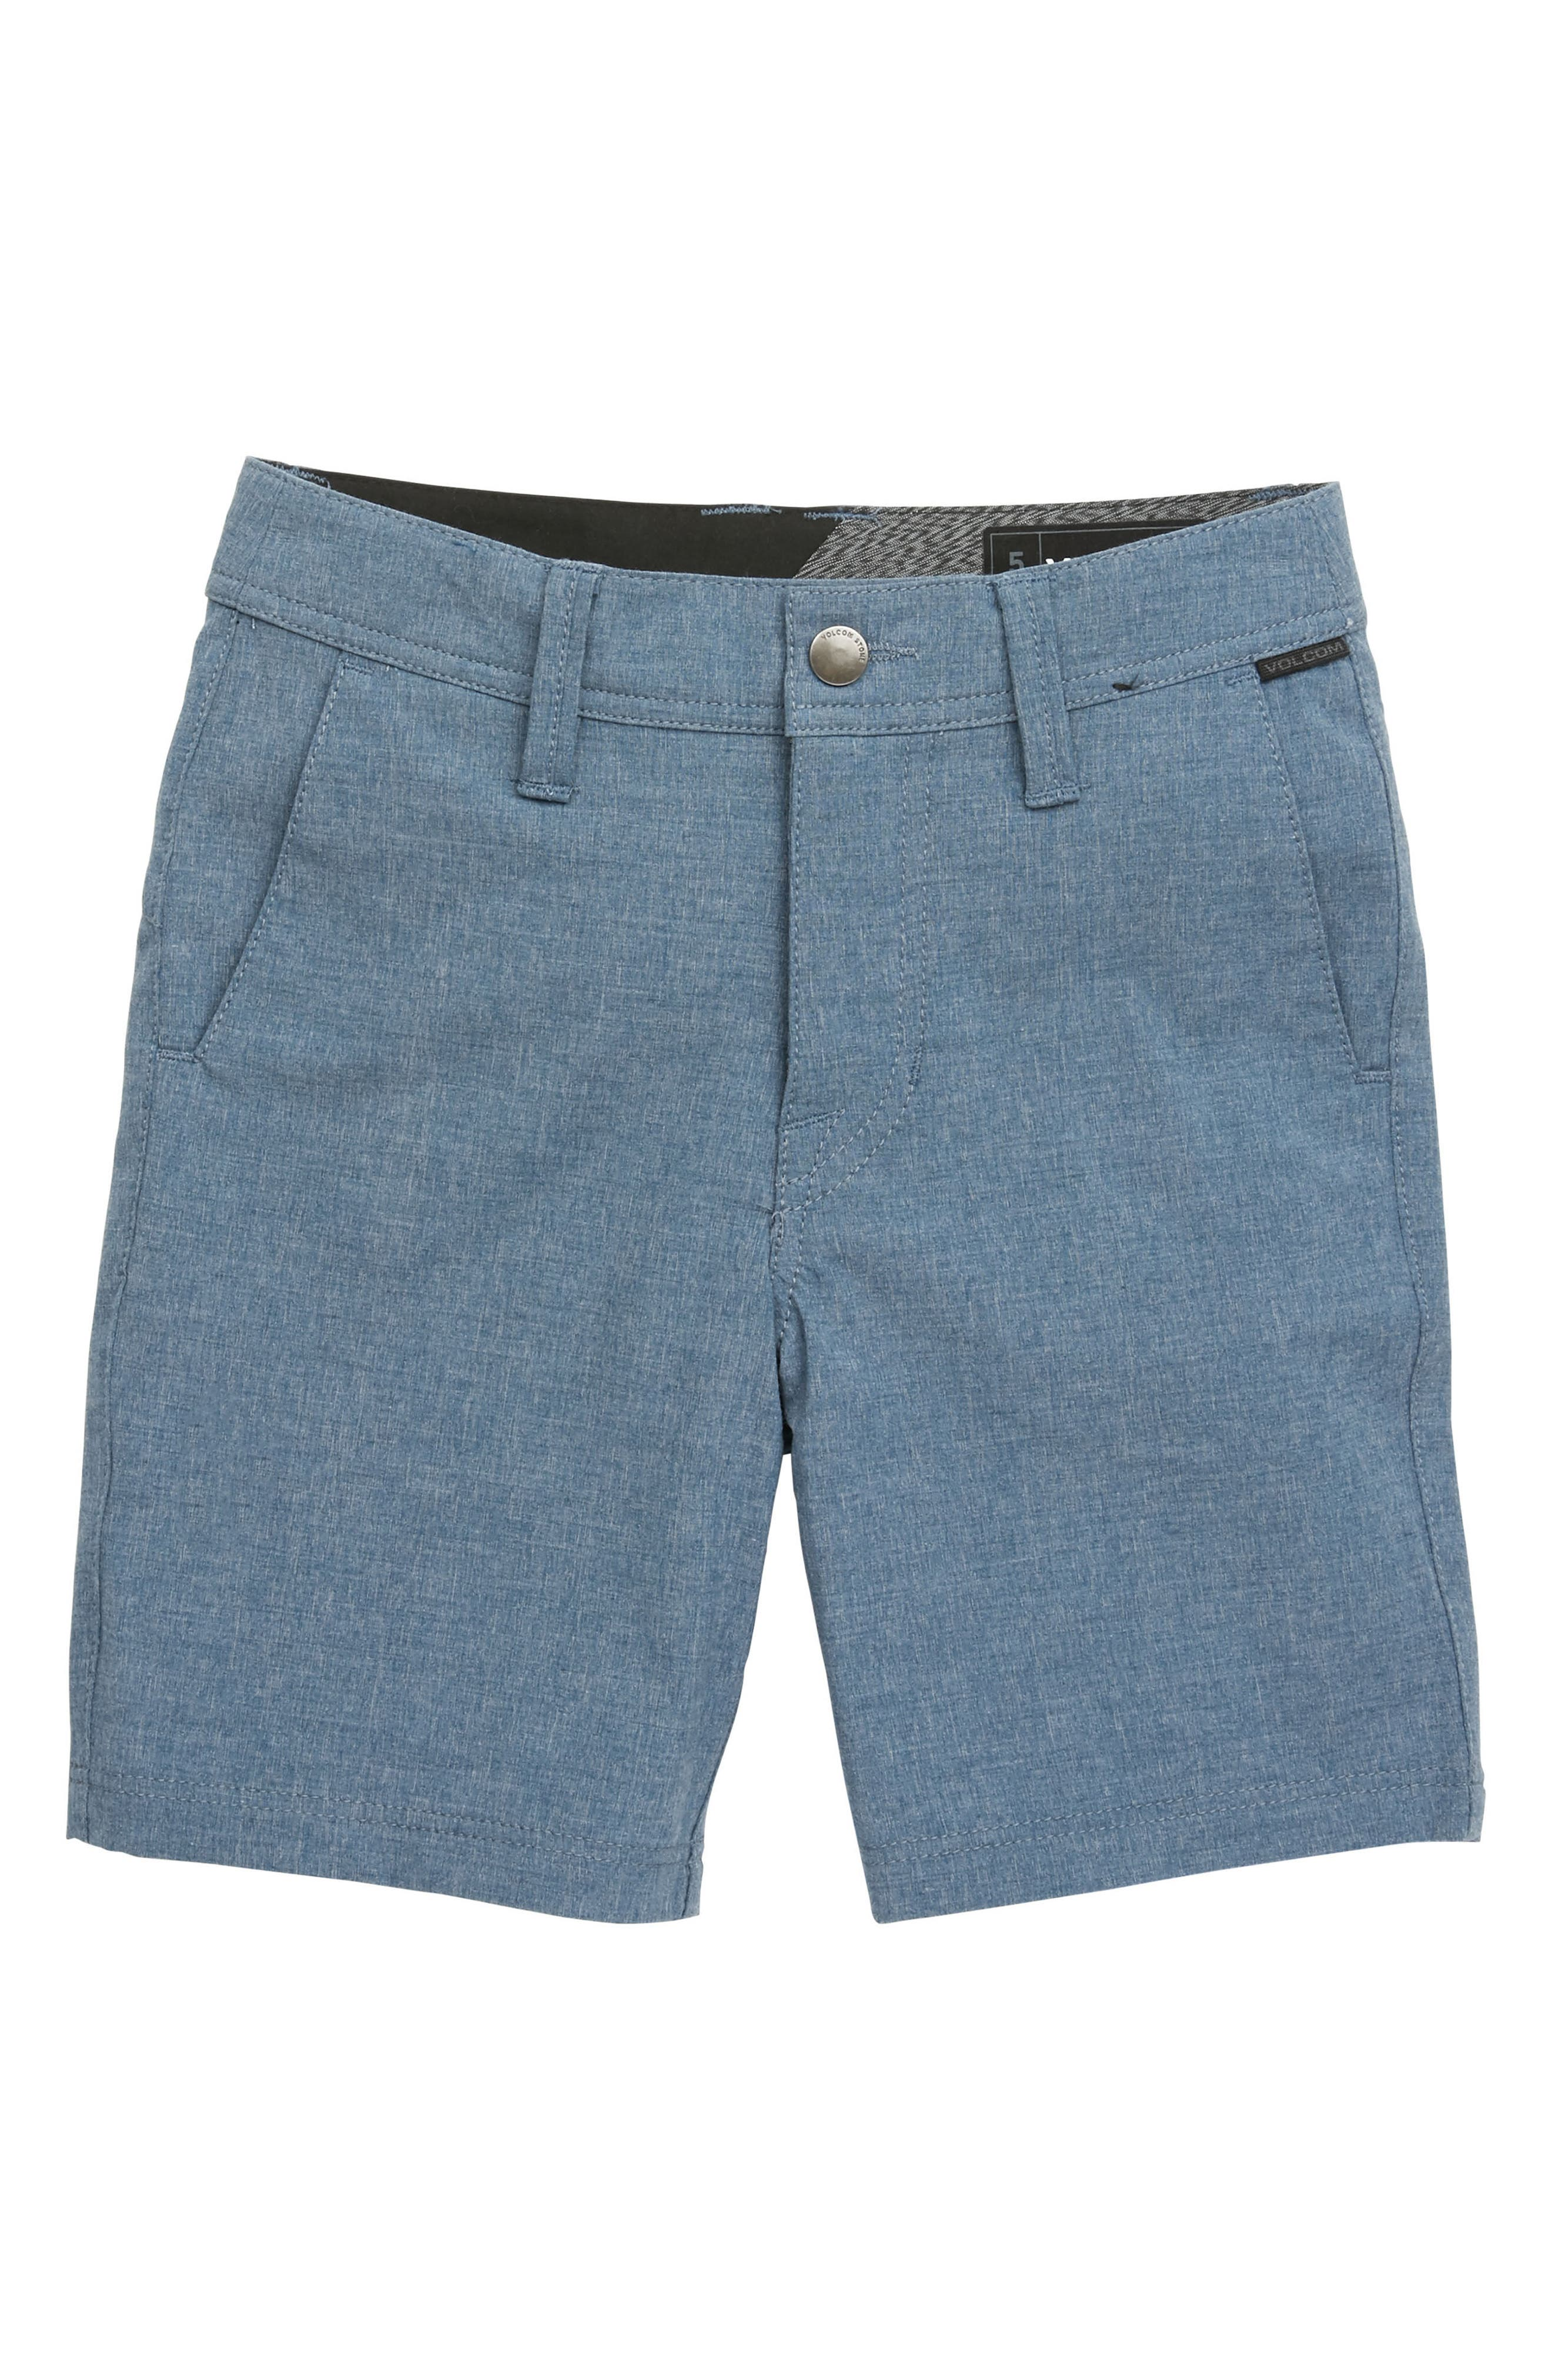 Surf N' Turf Static Hybrid Shorts,                             Main thumbnail 1, color,                             Deep Blue